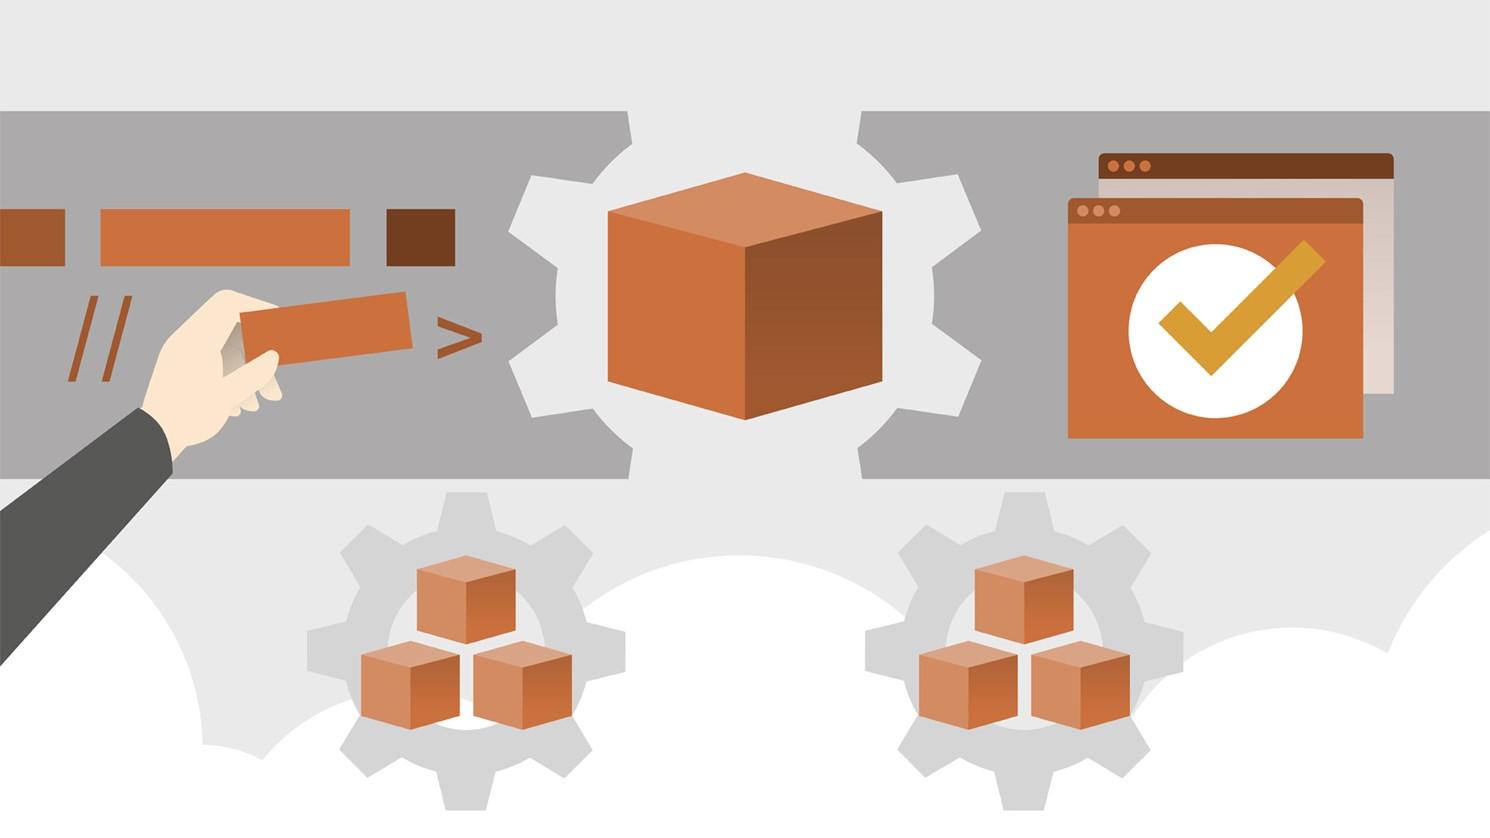 https://www lynda com/Business-tutorials/Standard-containers/181730